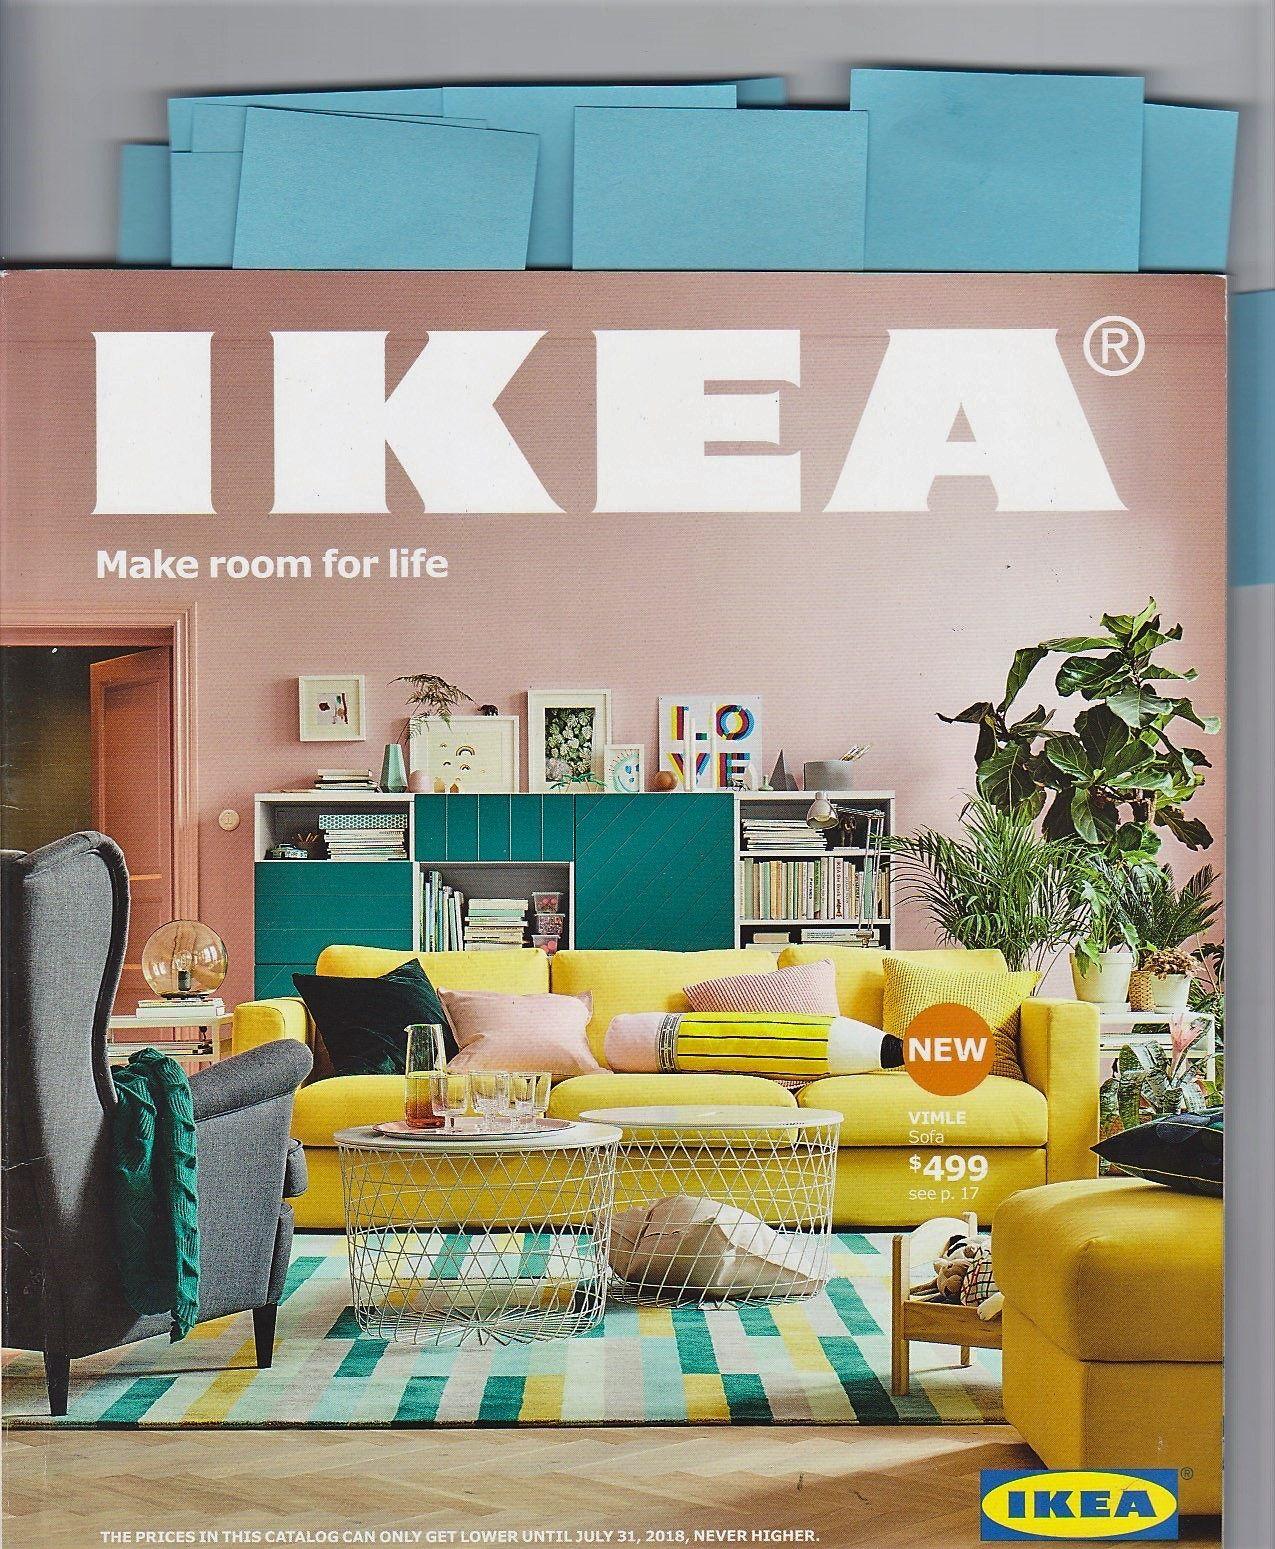 IKEA 2018 Catalog Sneak Peek & Top 10 New Product Countdown